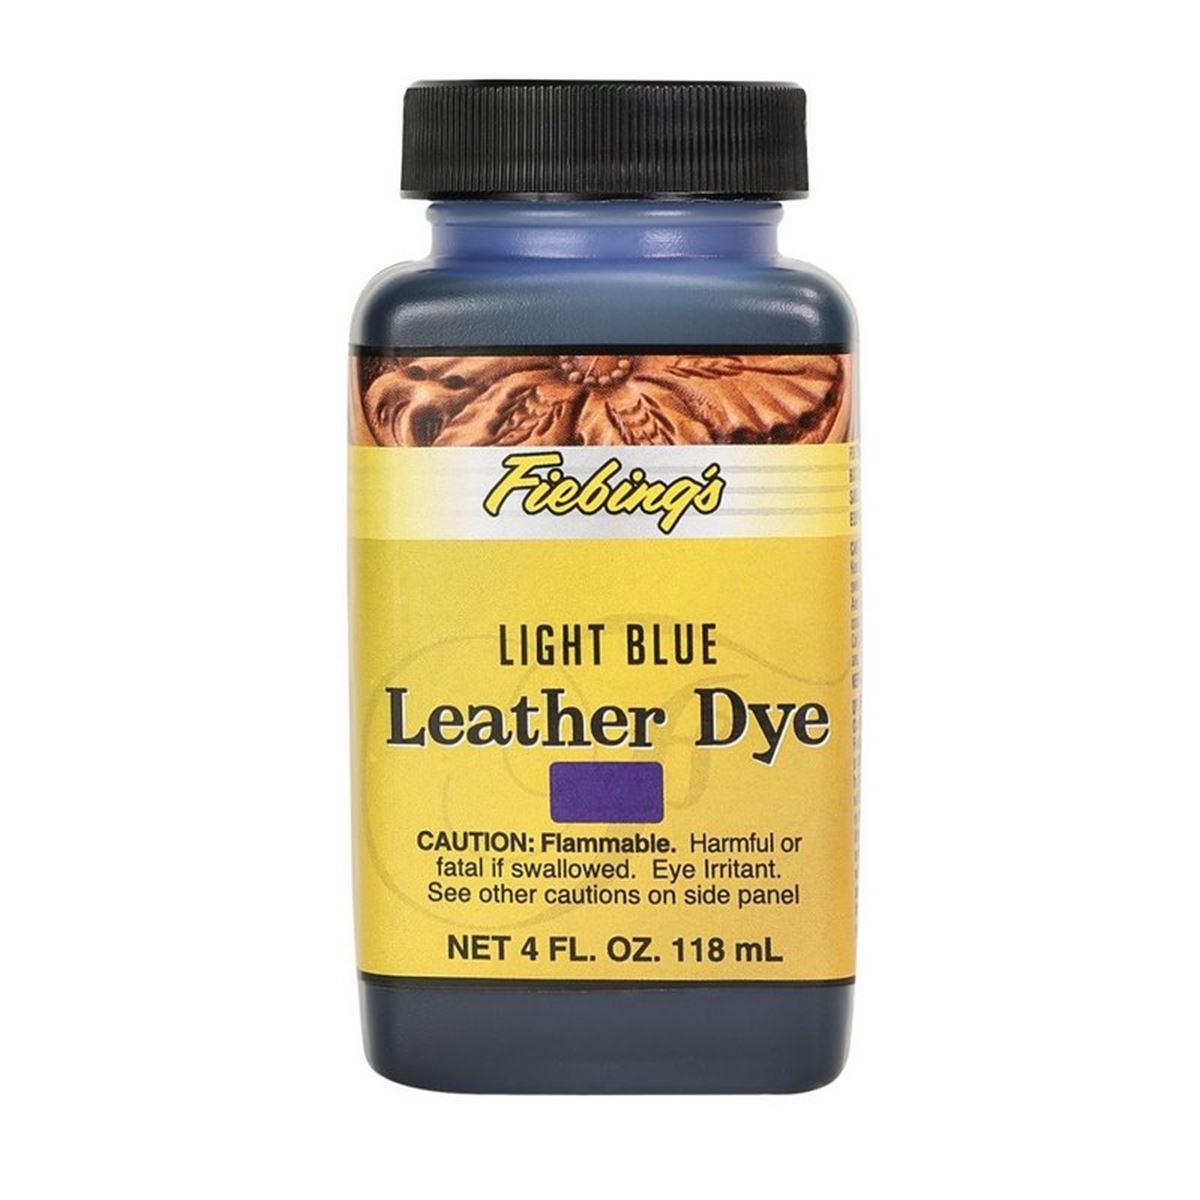 Teinture pour cuir FIEBING'S Leather dye - BLEU - BLUE LIGHT